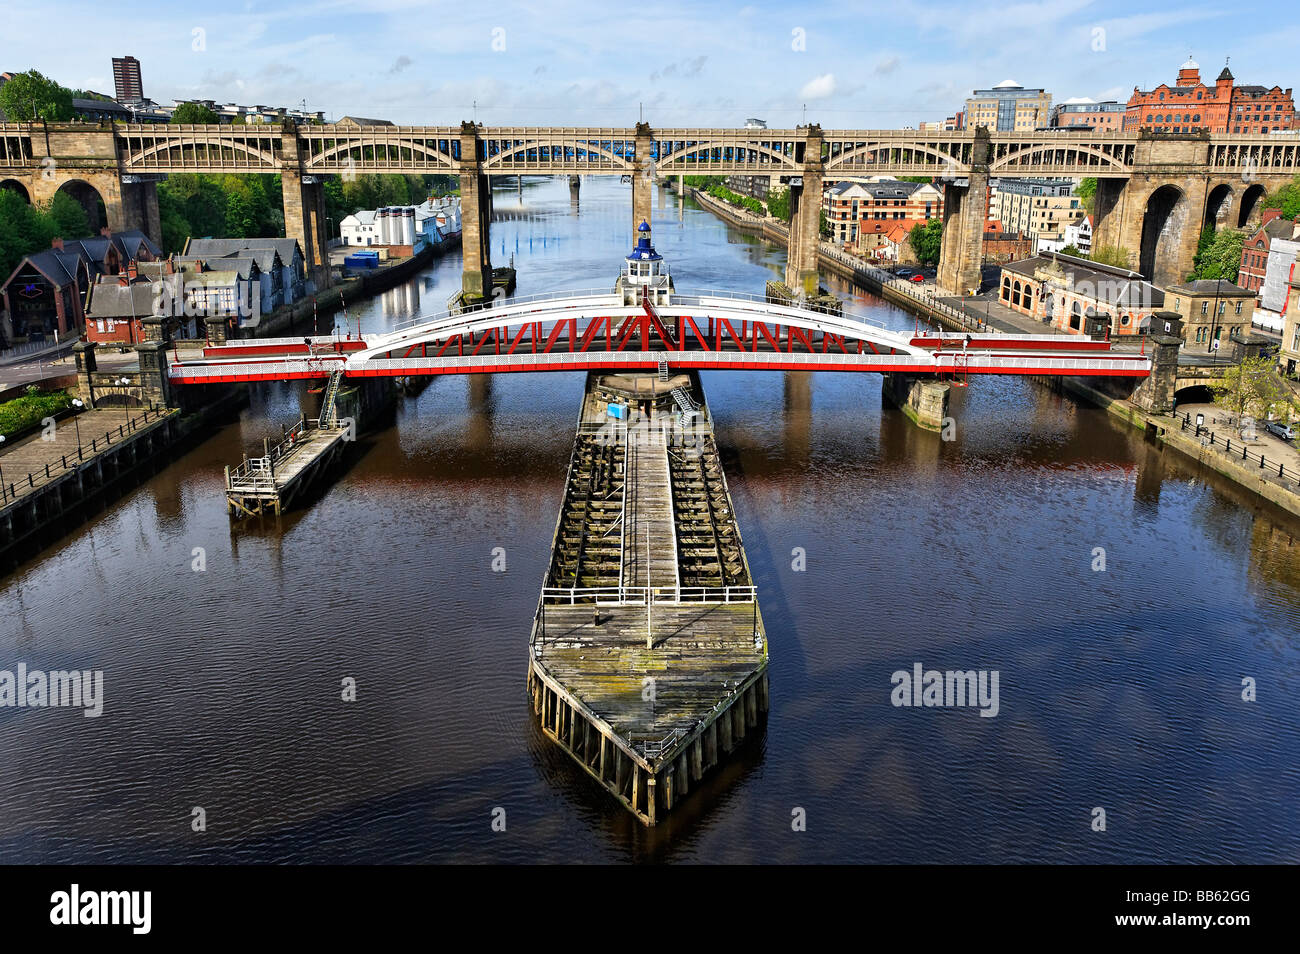 Swing Bridge, linking Gateshead and Newcastle-upon-Tyne - Stock Image